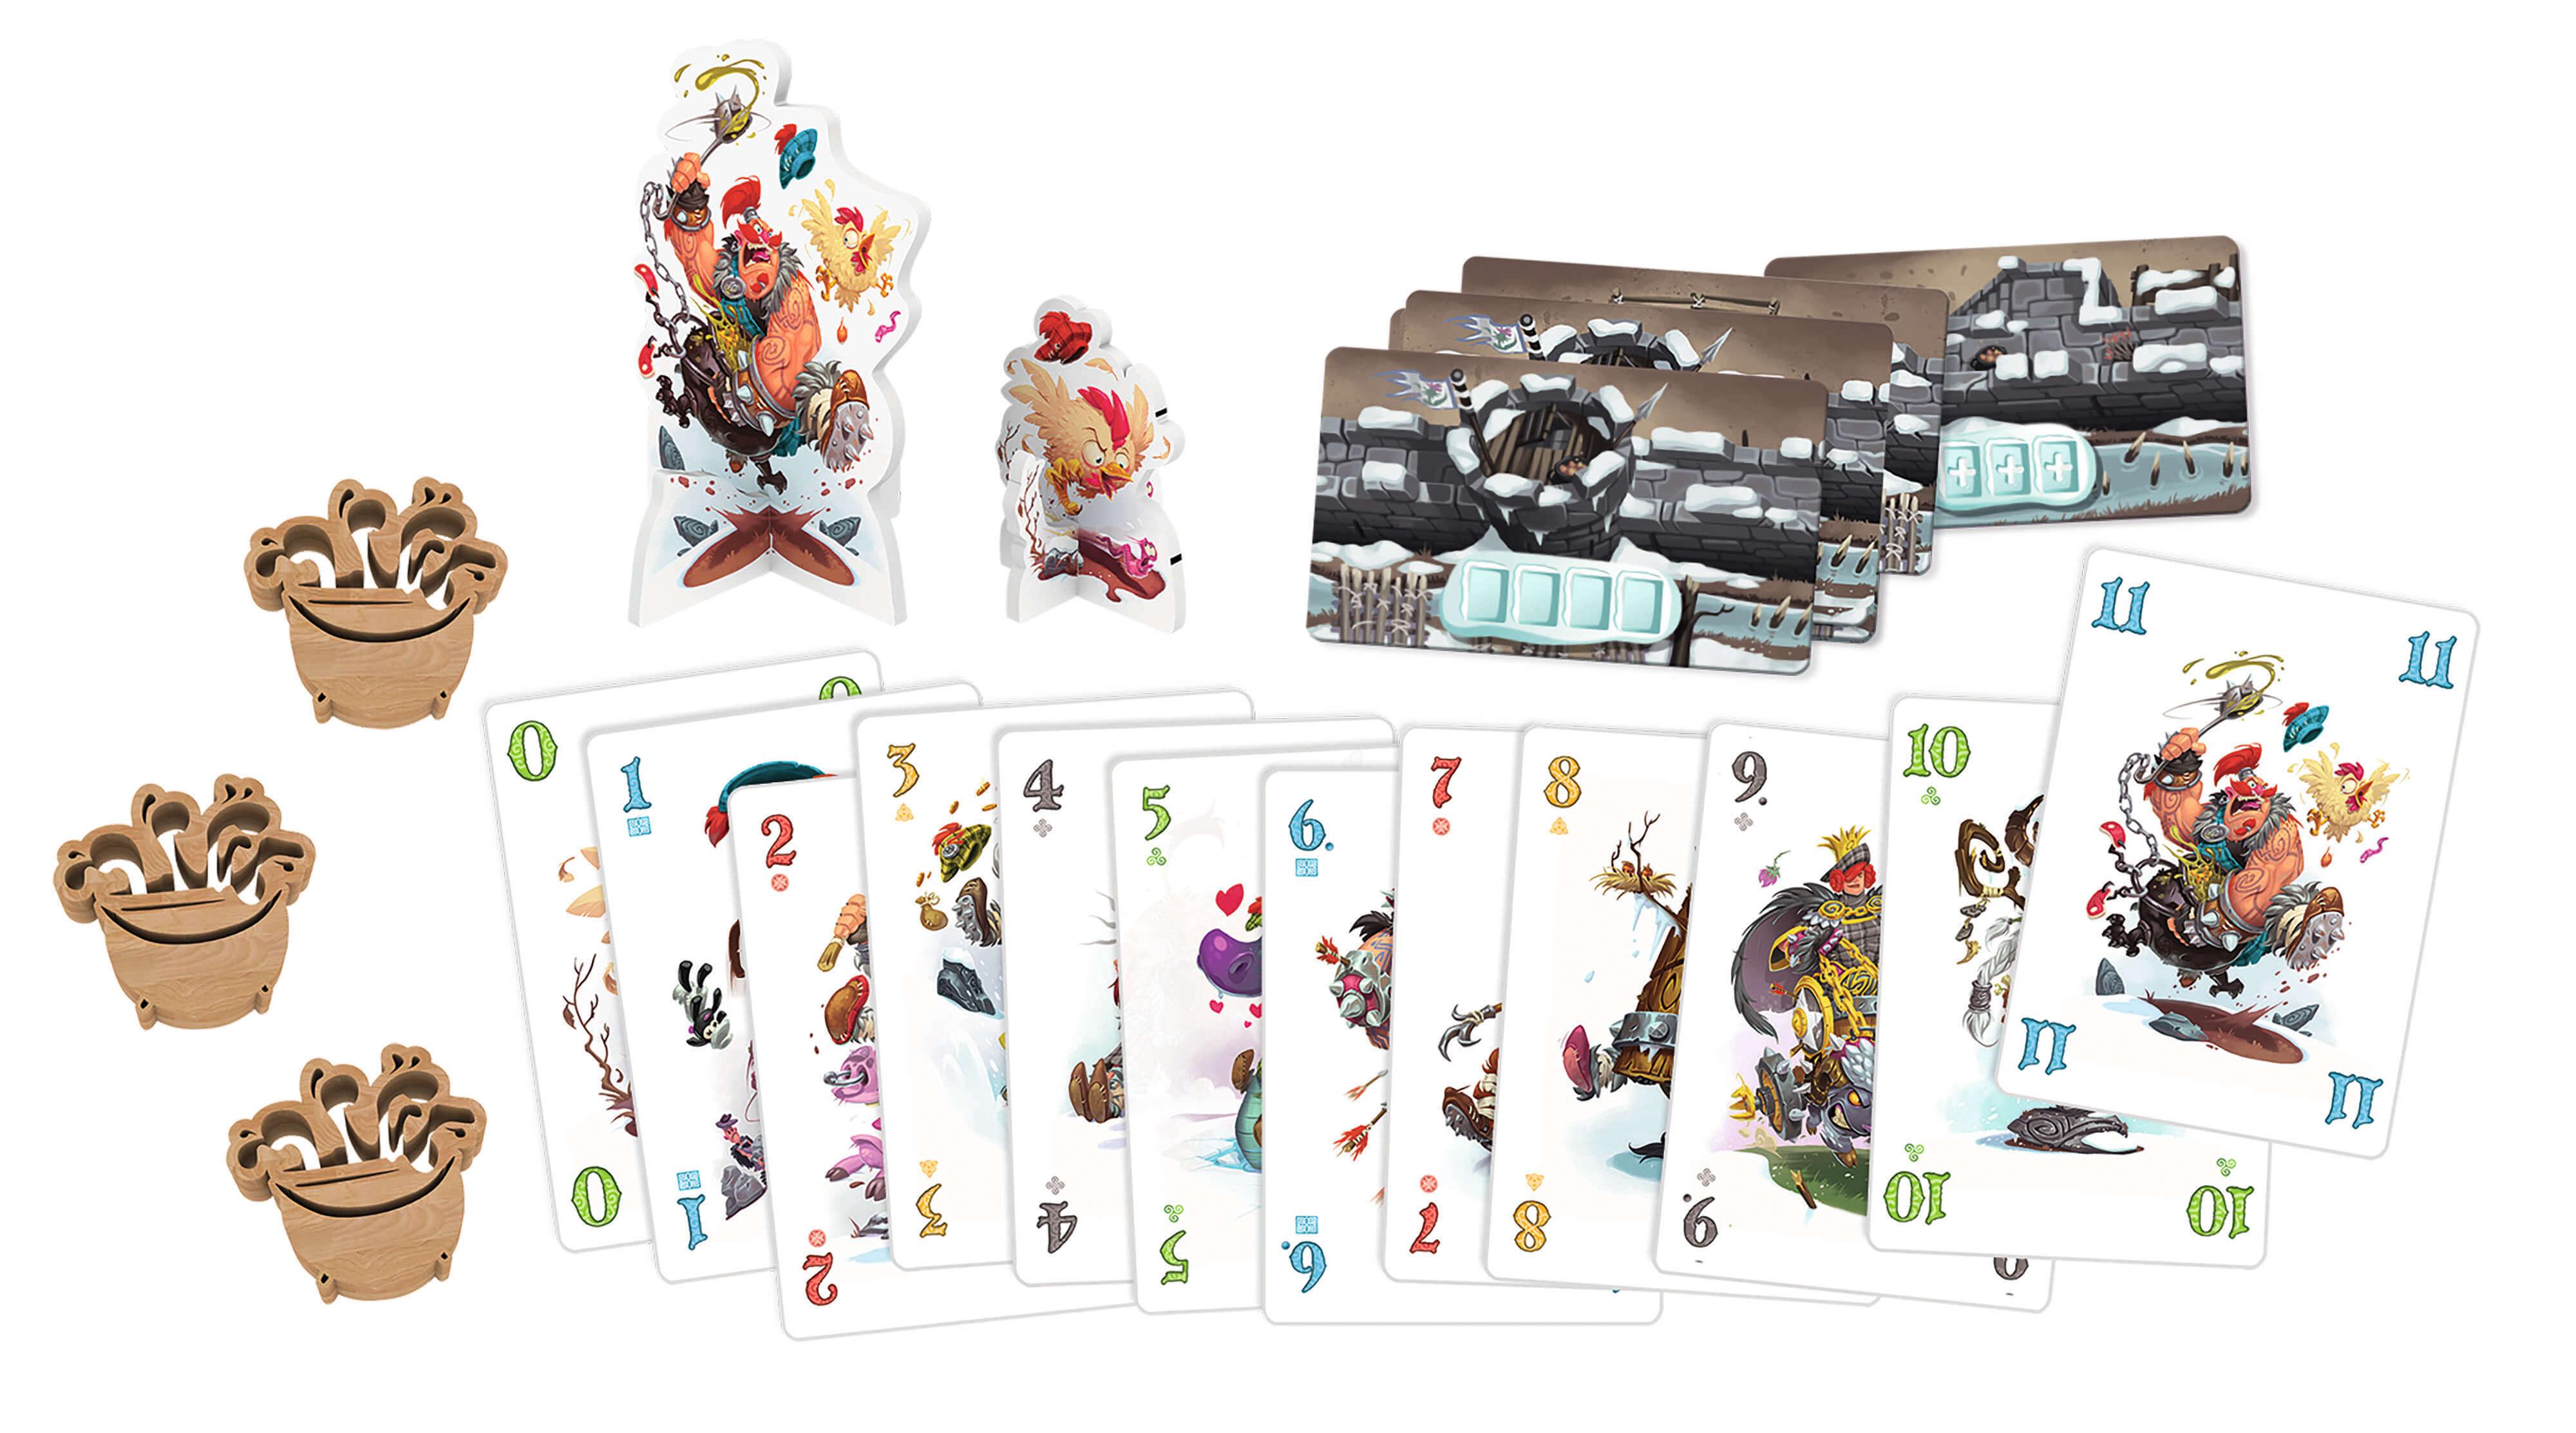 Spielmaterial mit Karten- Schotten Totten 2